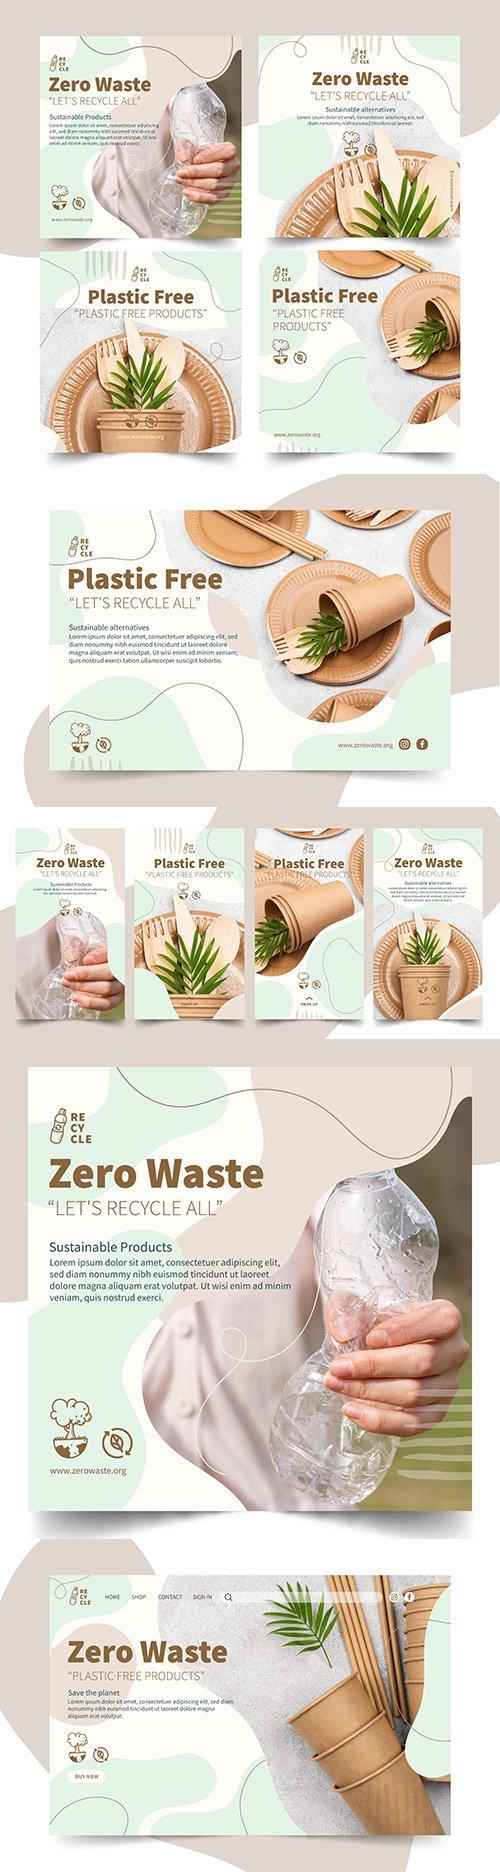 Zero waste and plastic free products design illustration